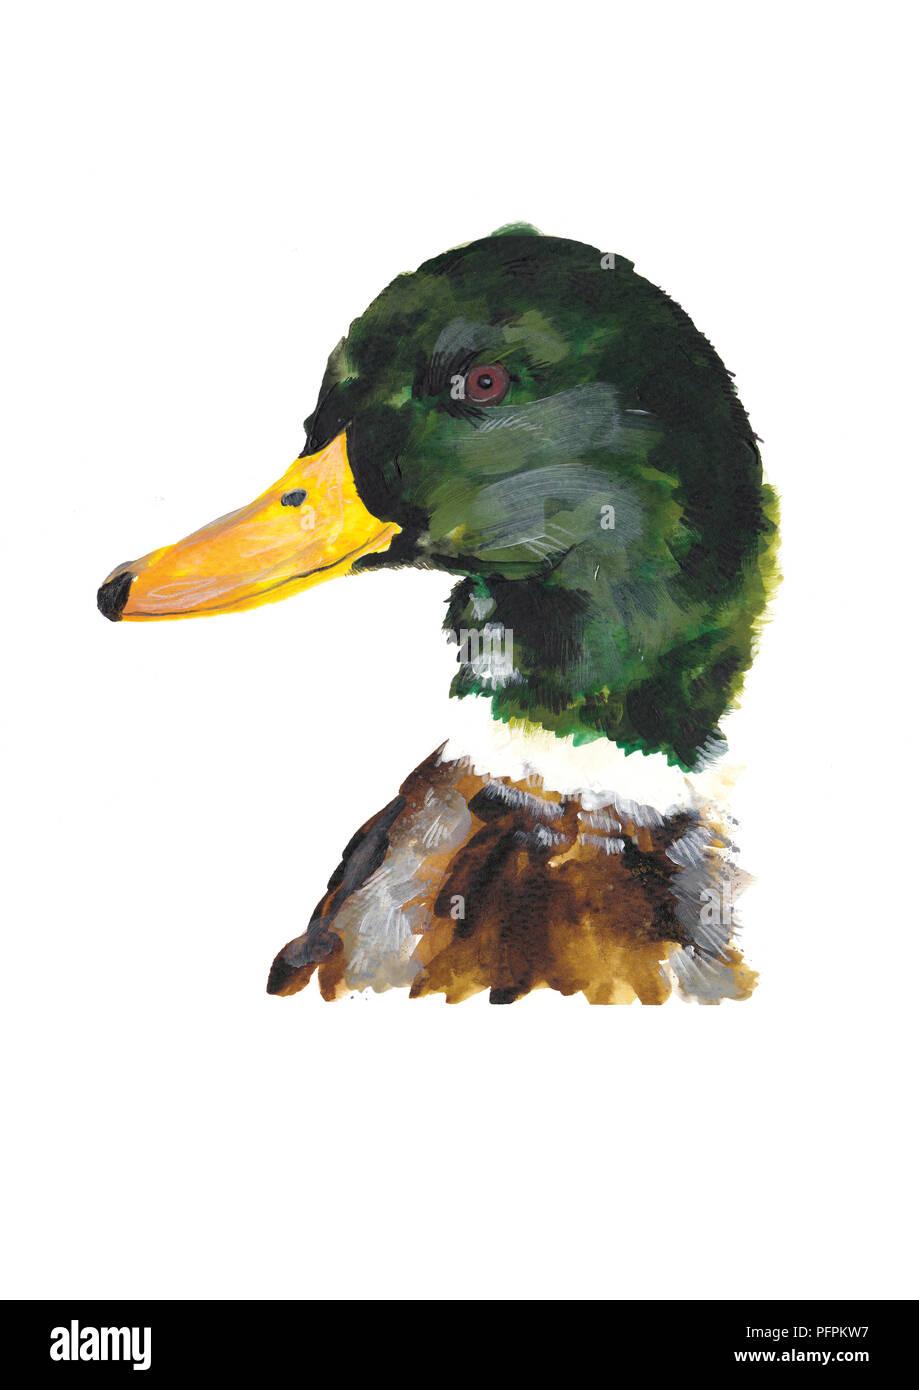 Duck - Stock Image